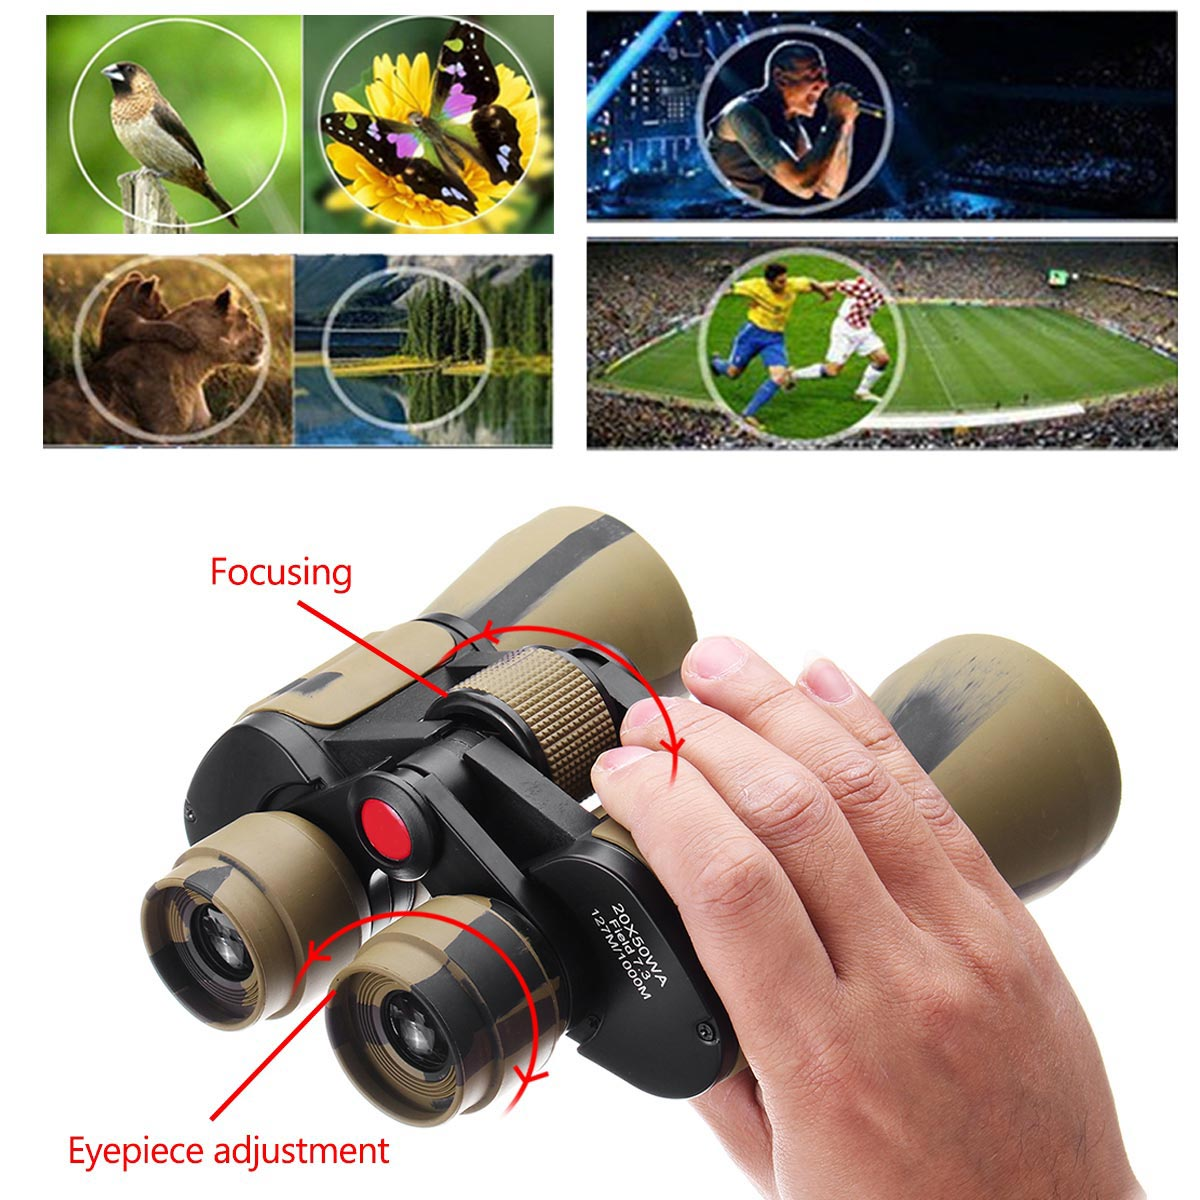 20x50 High Clarity Binoculars Powerful Military binocular For Outdoor Hunting Optical glass Hd Telescope low light Night Vision 2